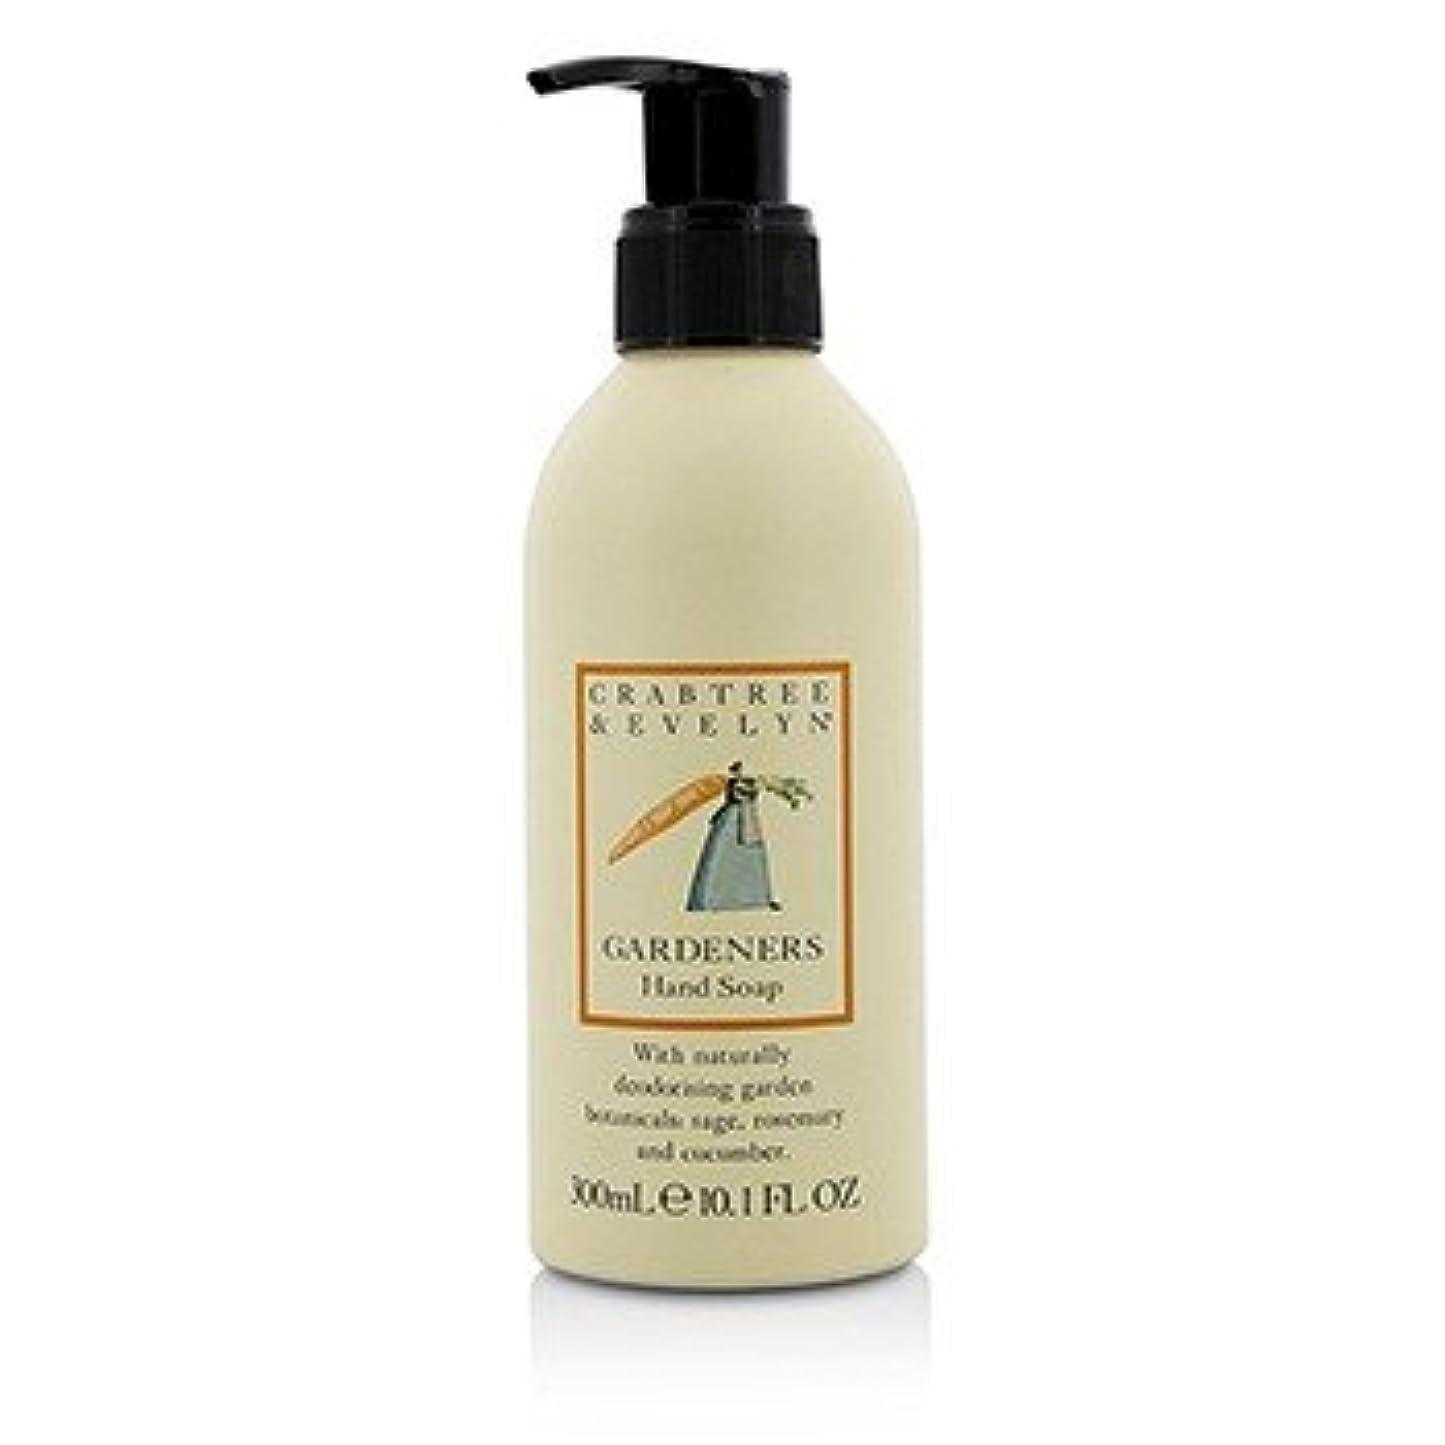 [Crabtree & Evelyn] Gardeners Hand Soap 300ml/10.1oz